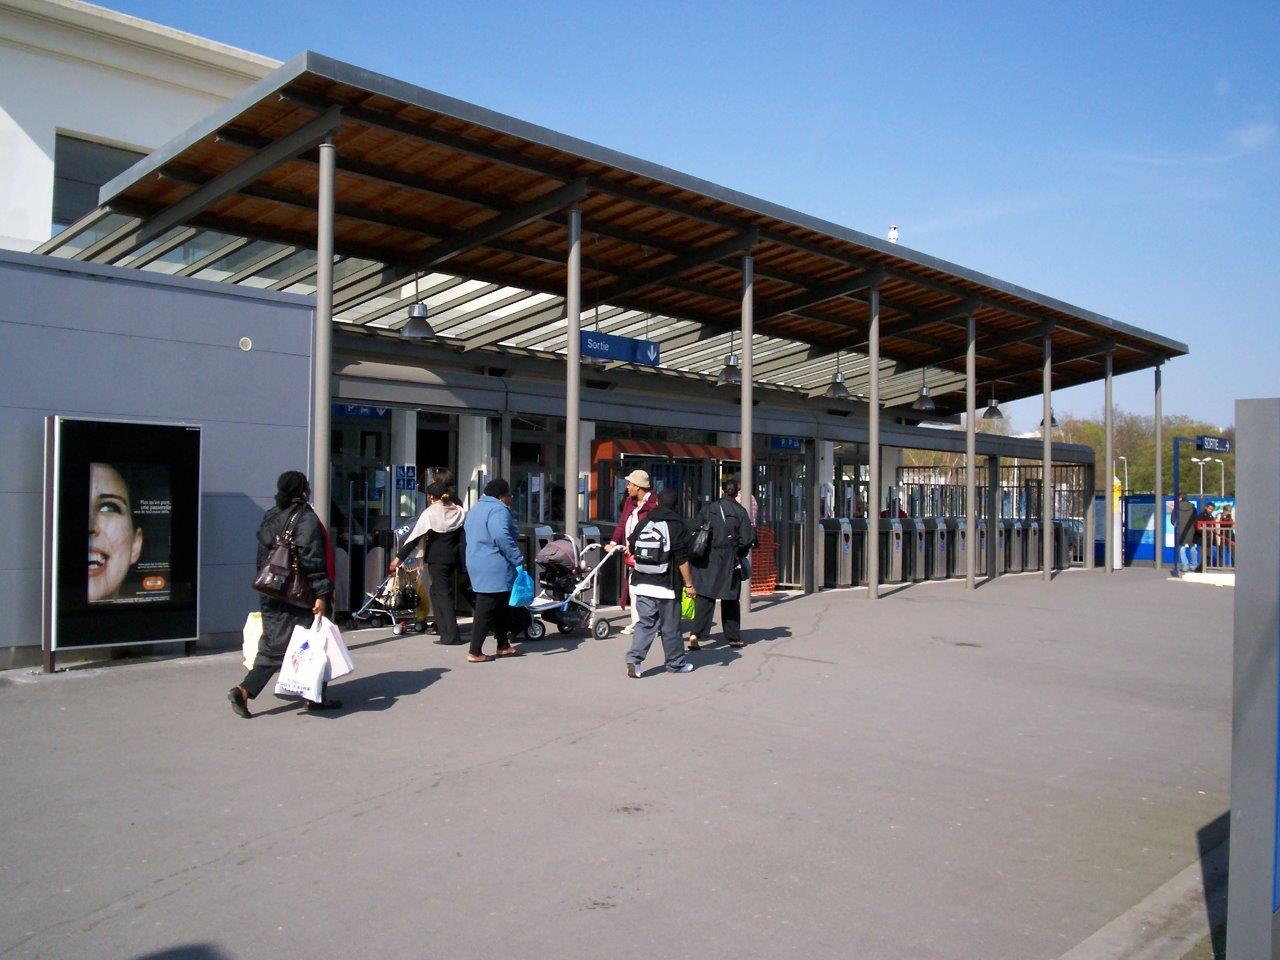 gare-du-vert-galant-train-station